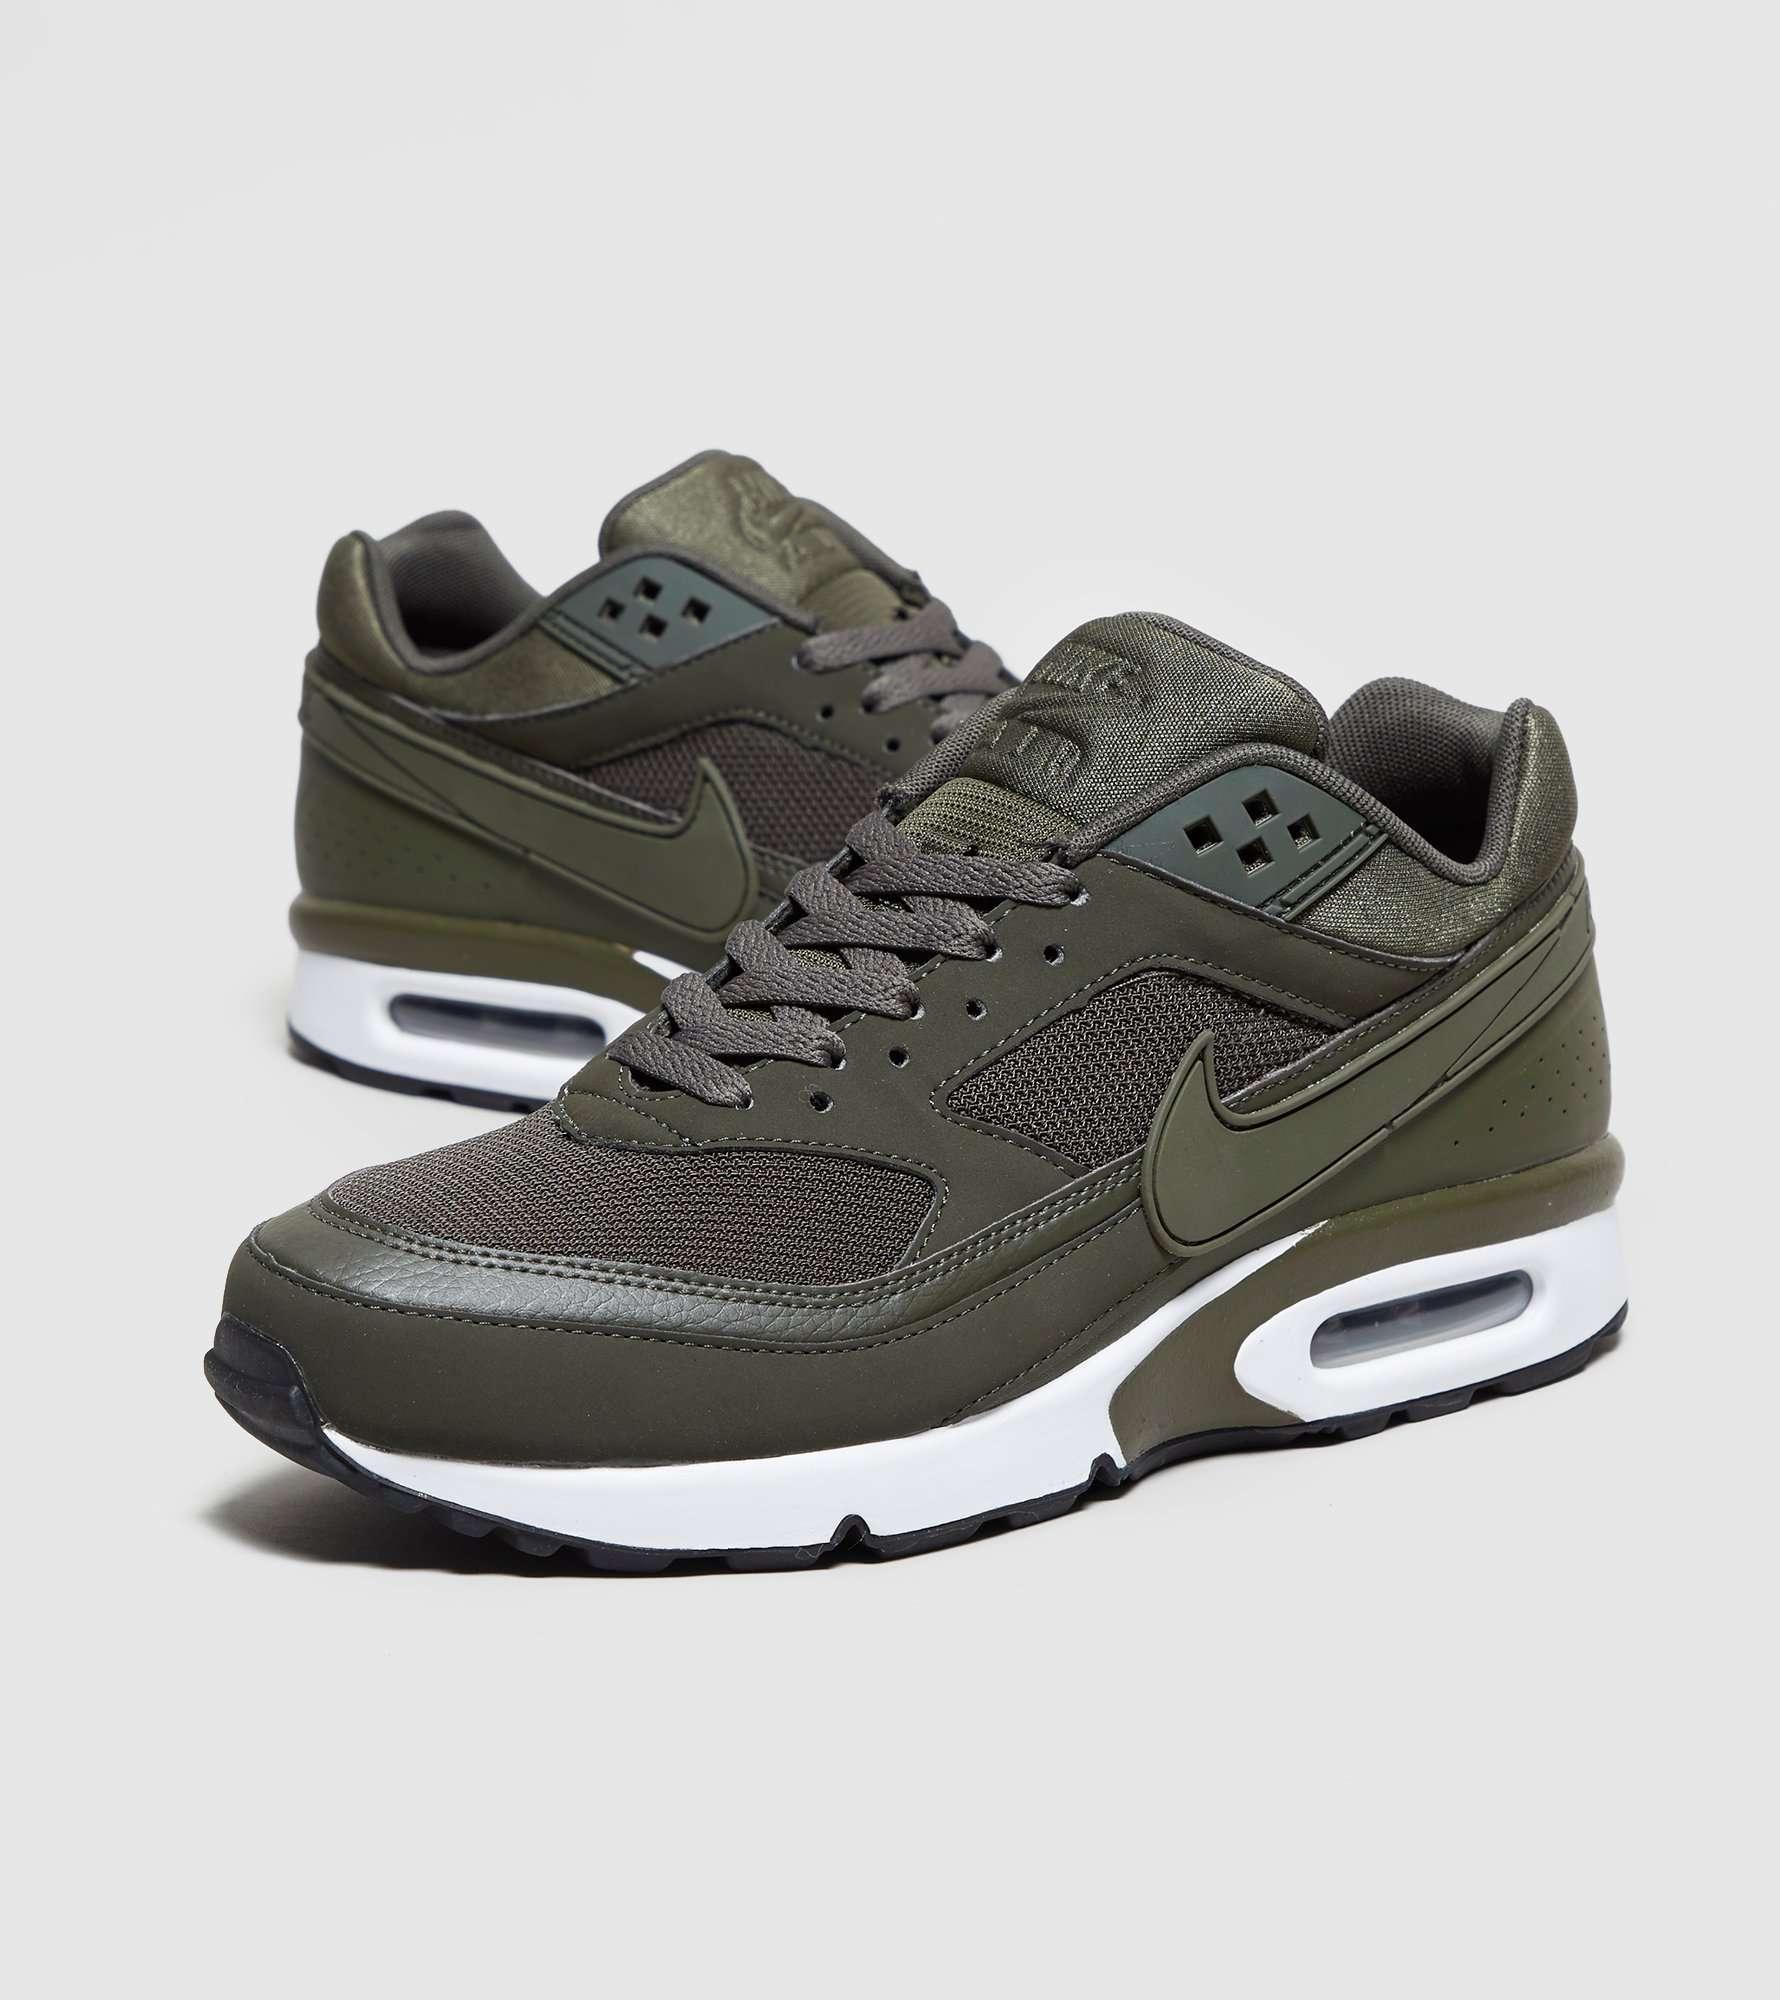 Nike 881981 300 Air Max BW Sneaker Khaki|42: